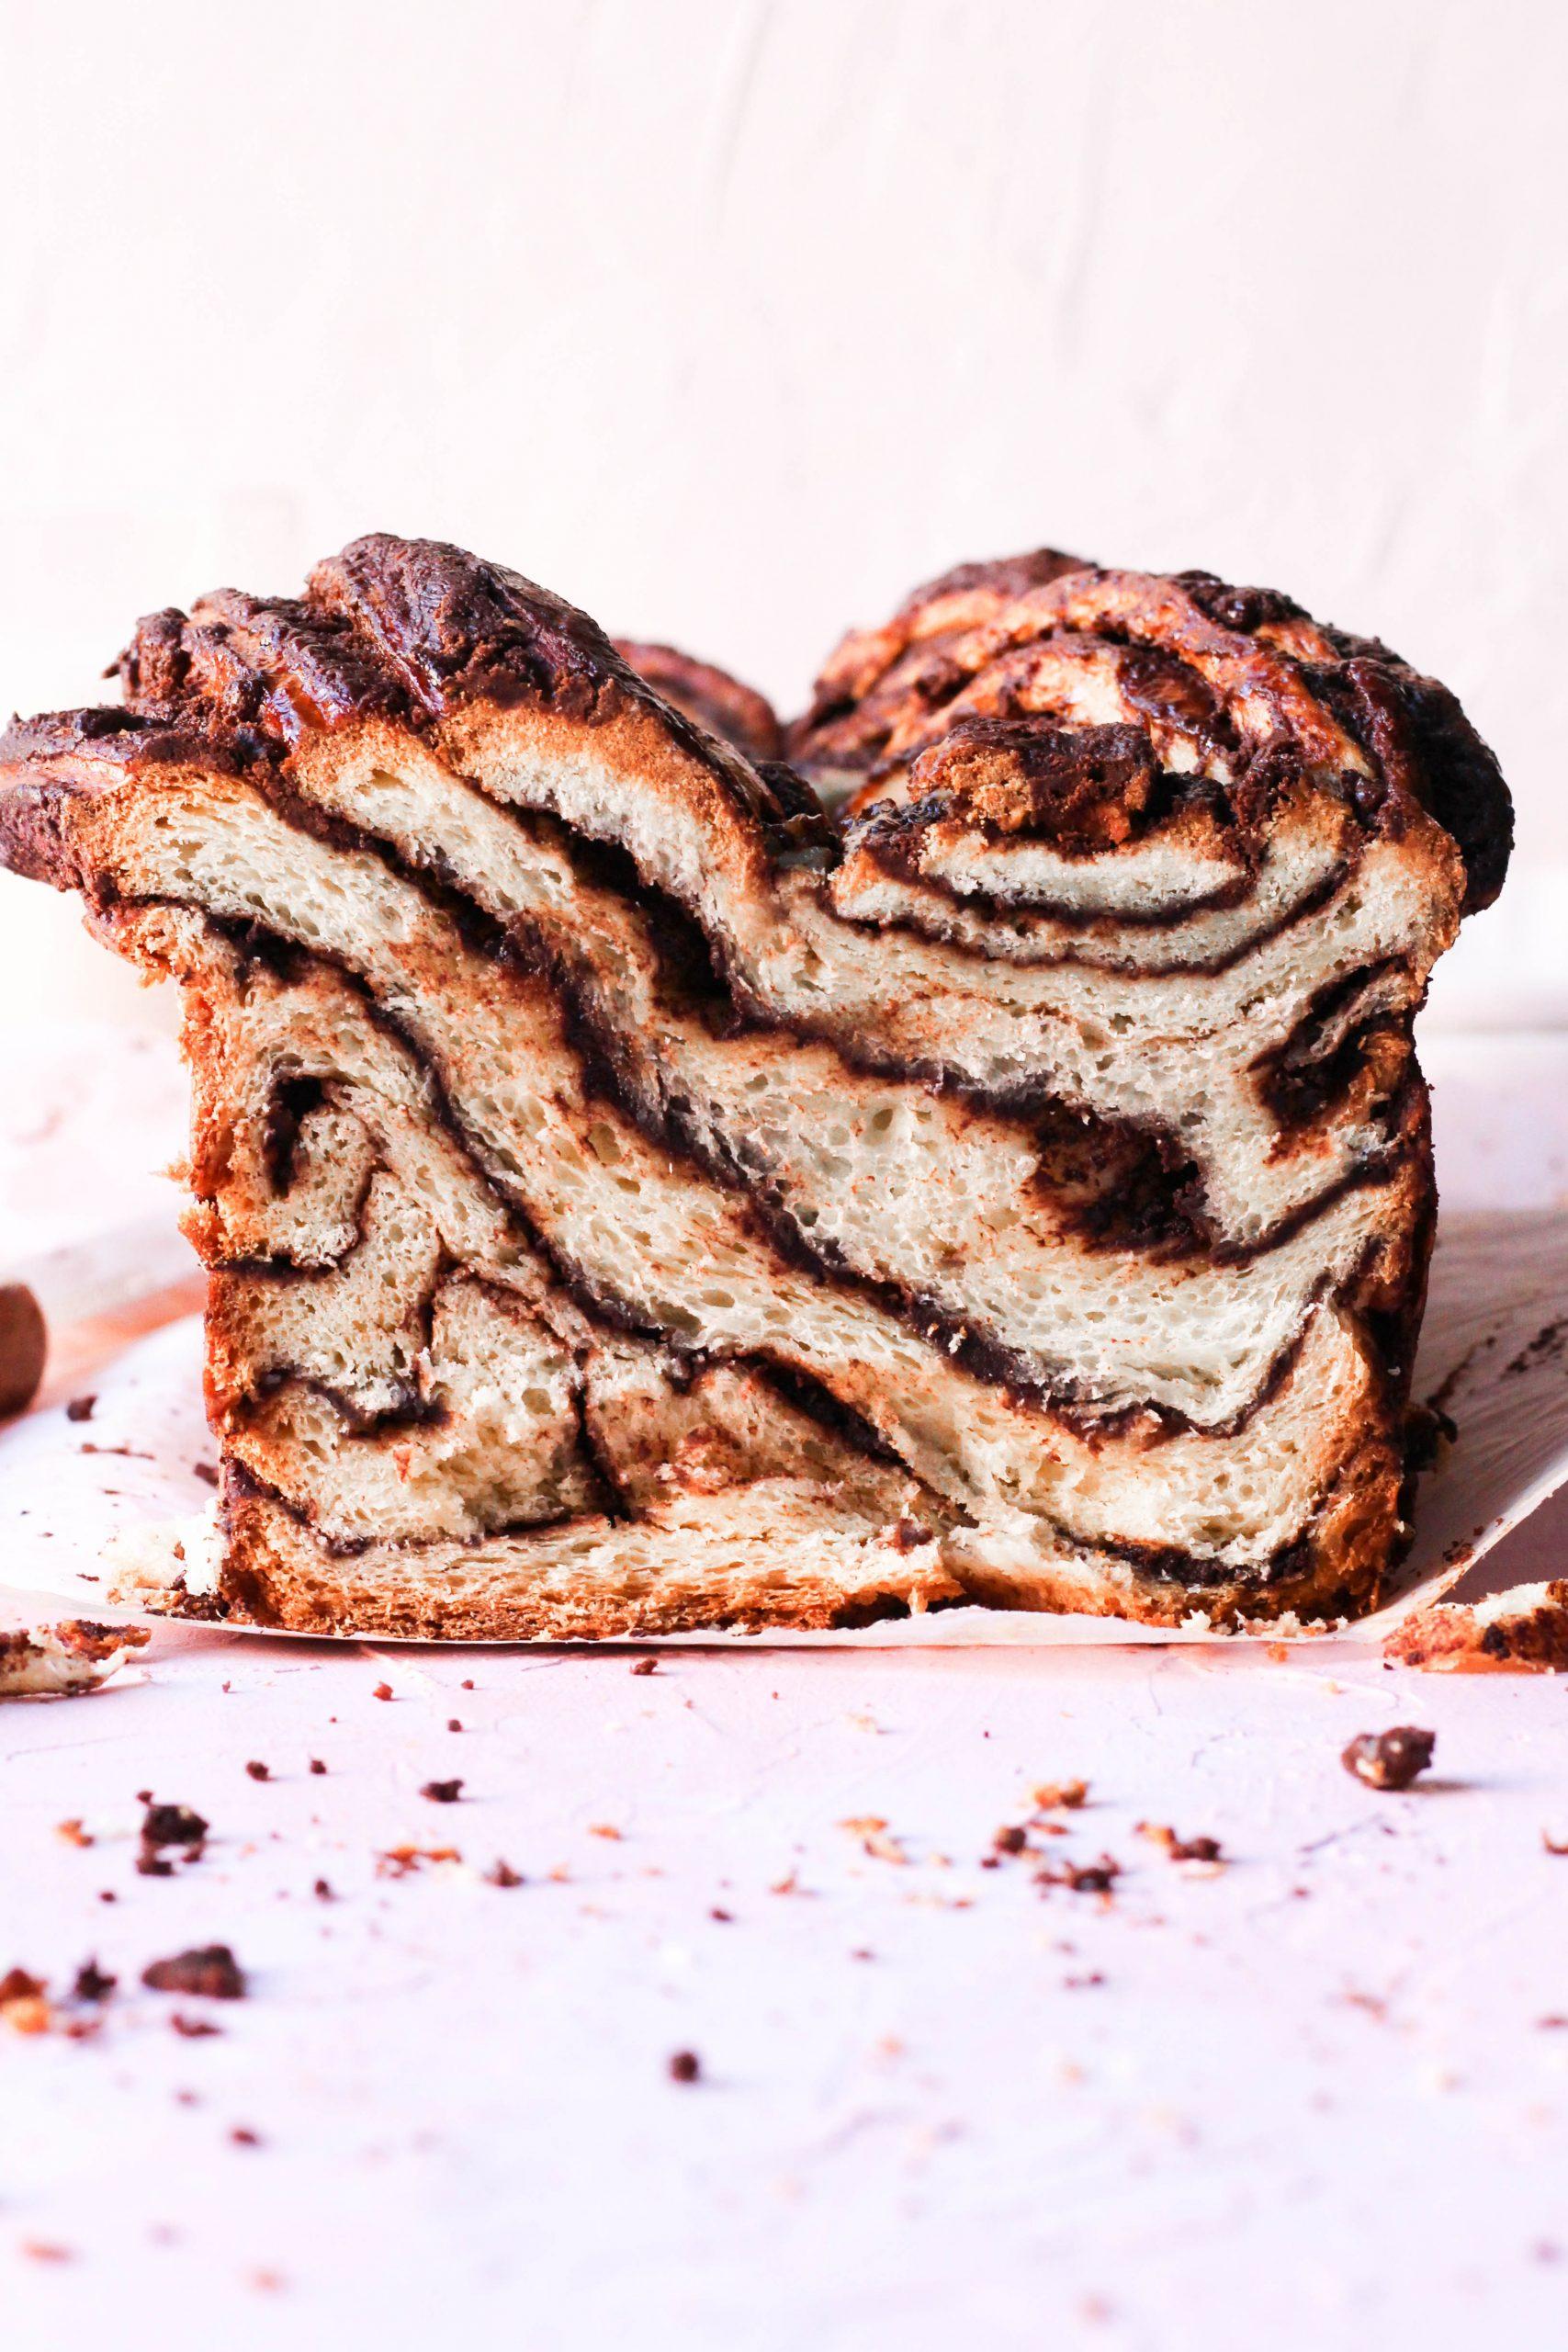 amazingly fluffy babka, brioche style bread with chocolate cinnamon swirls